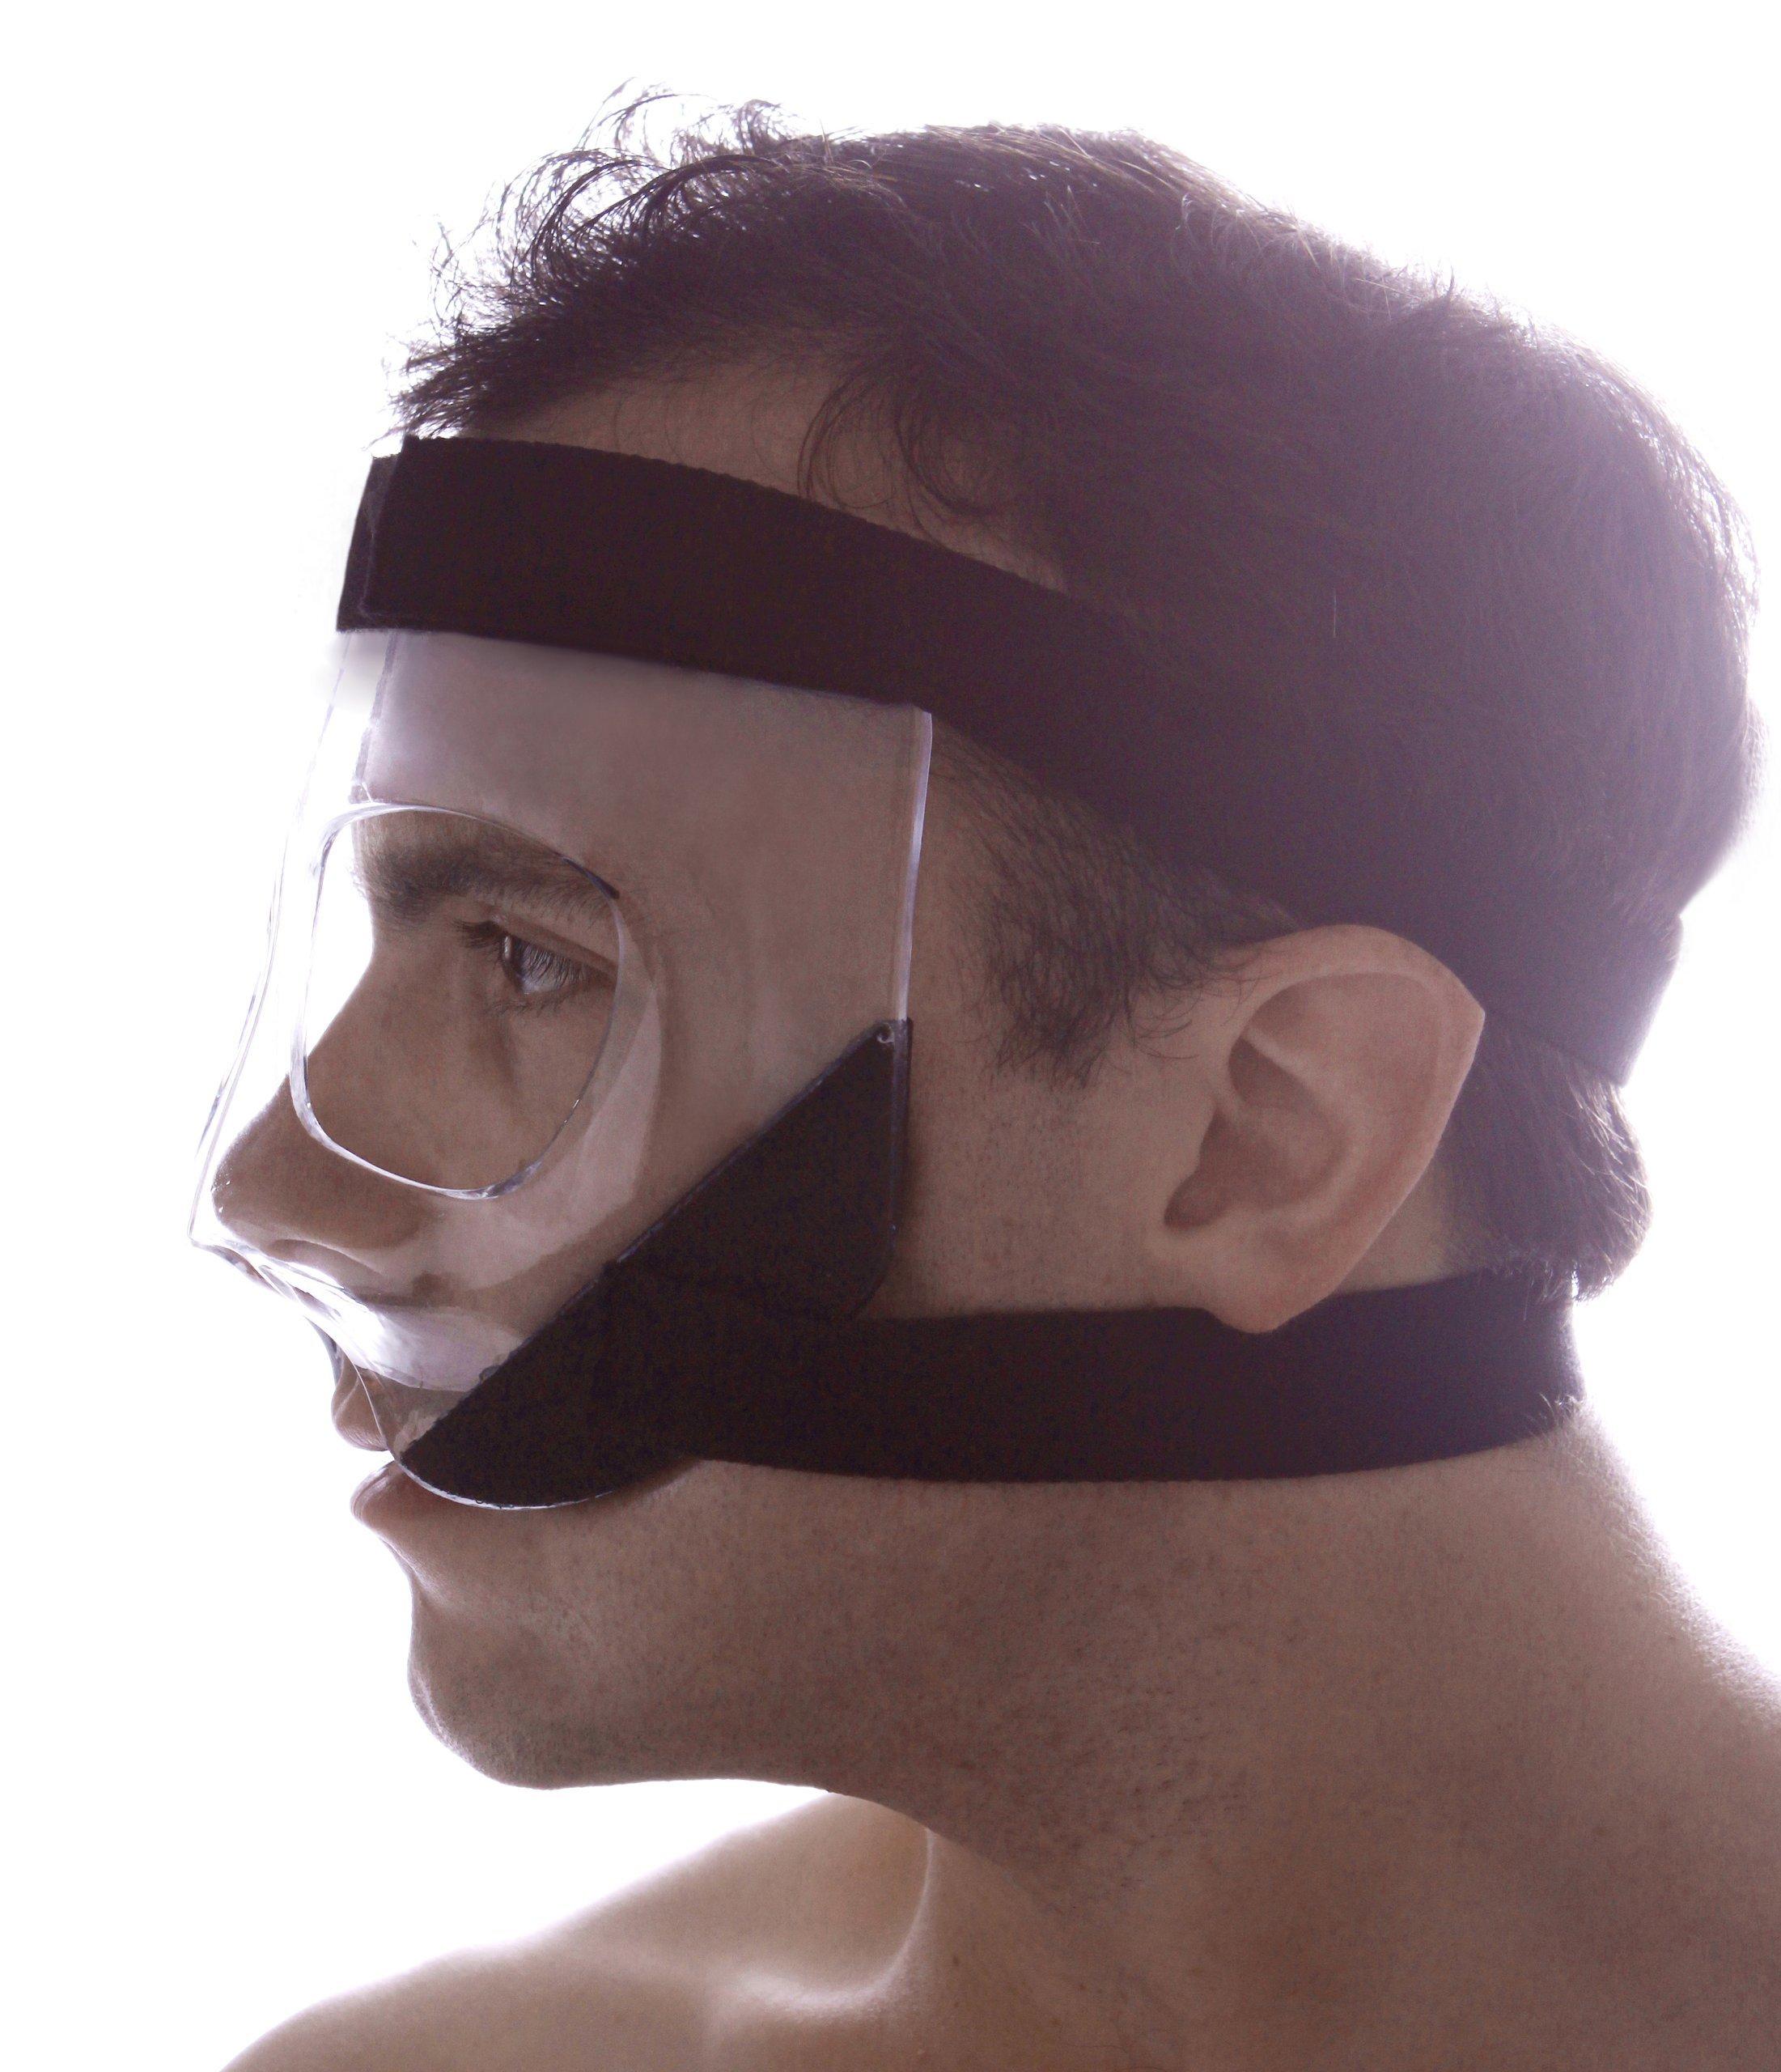 Маска для защиты носа спорт